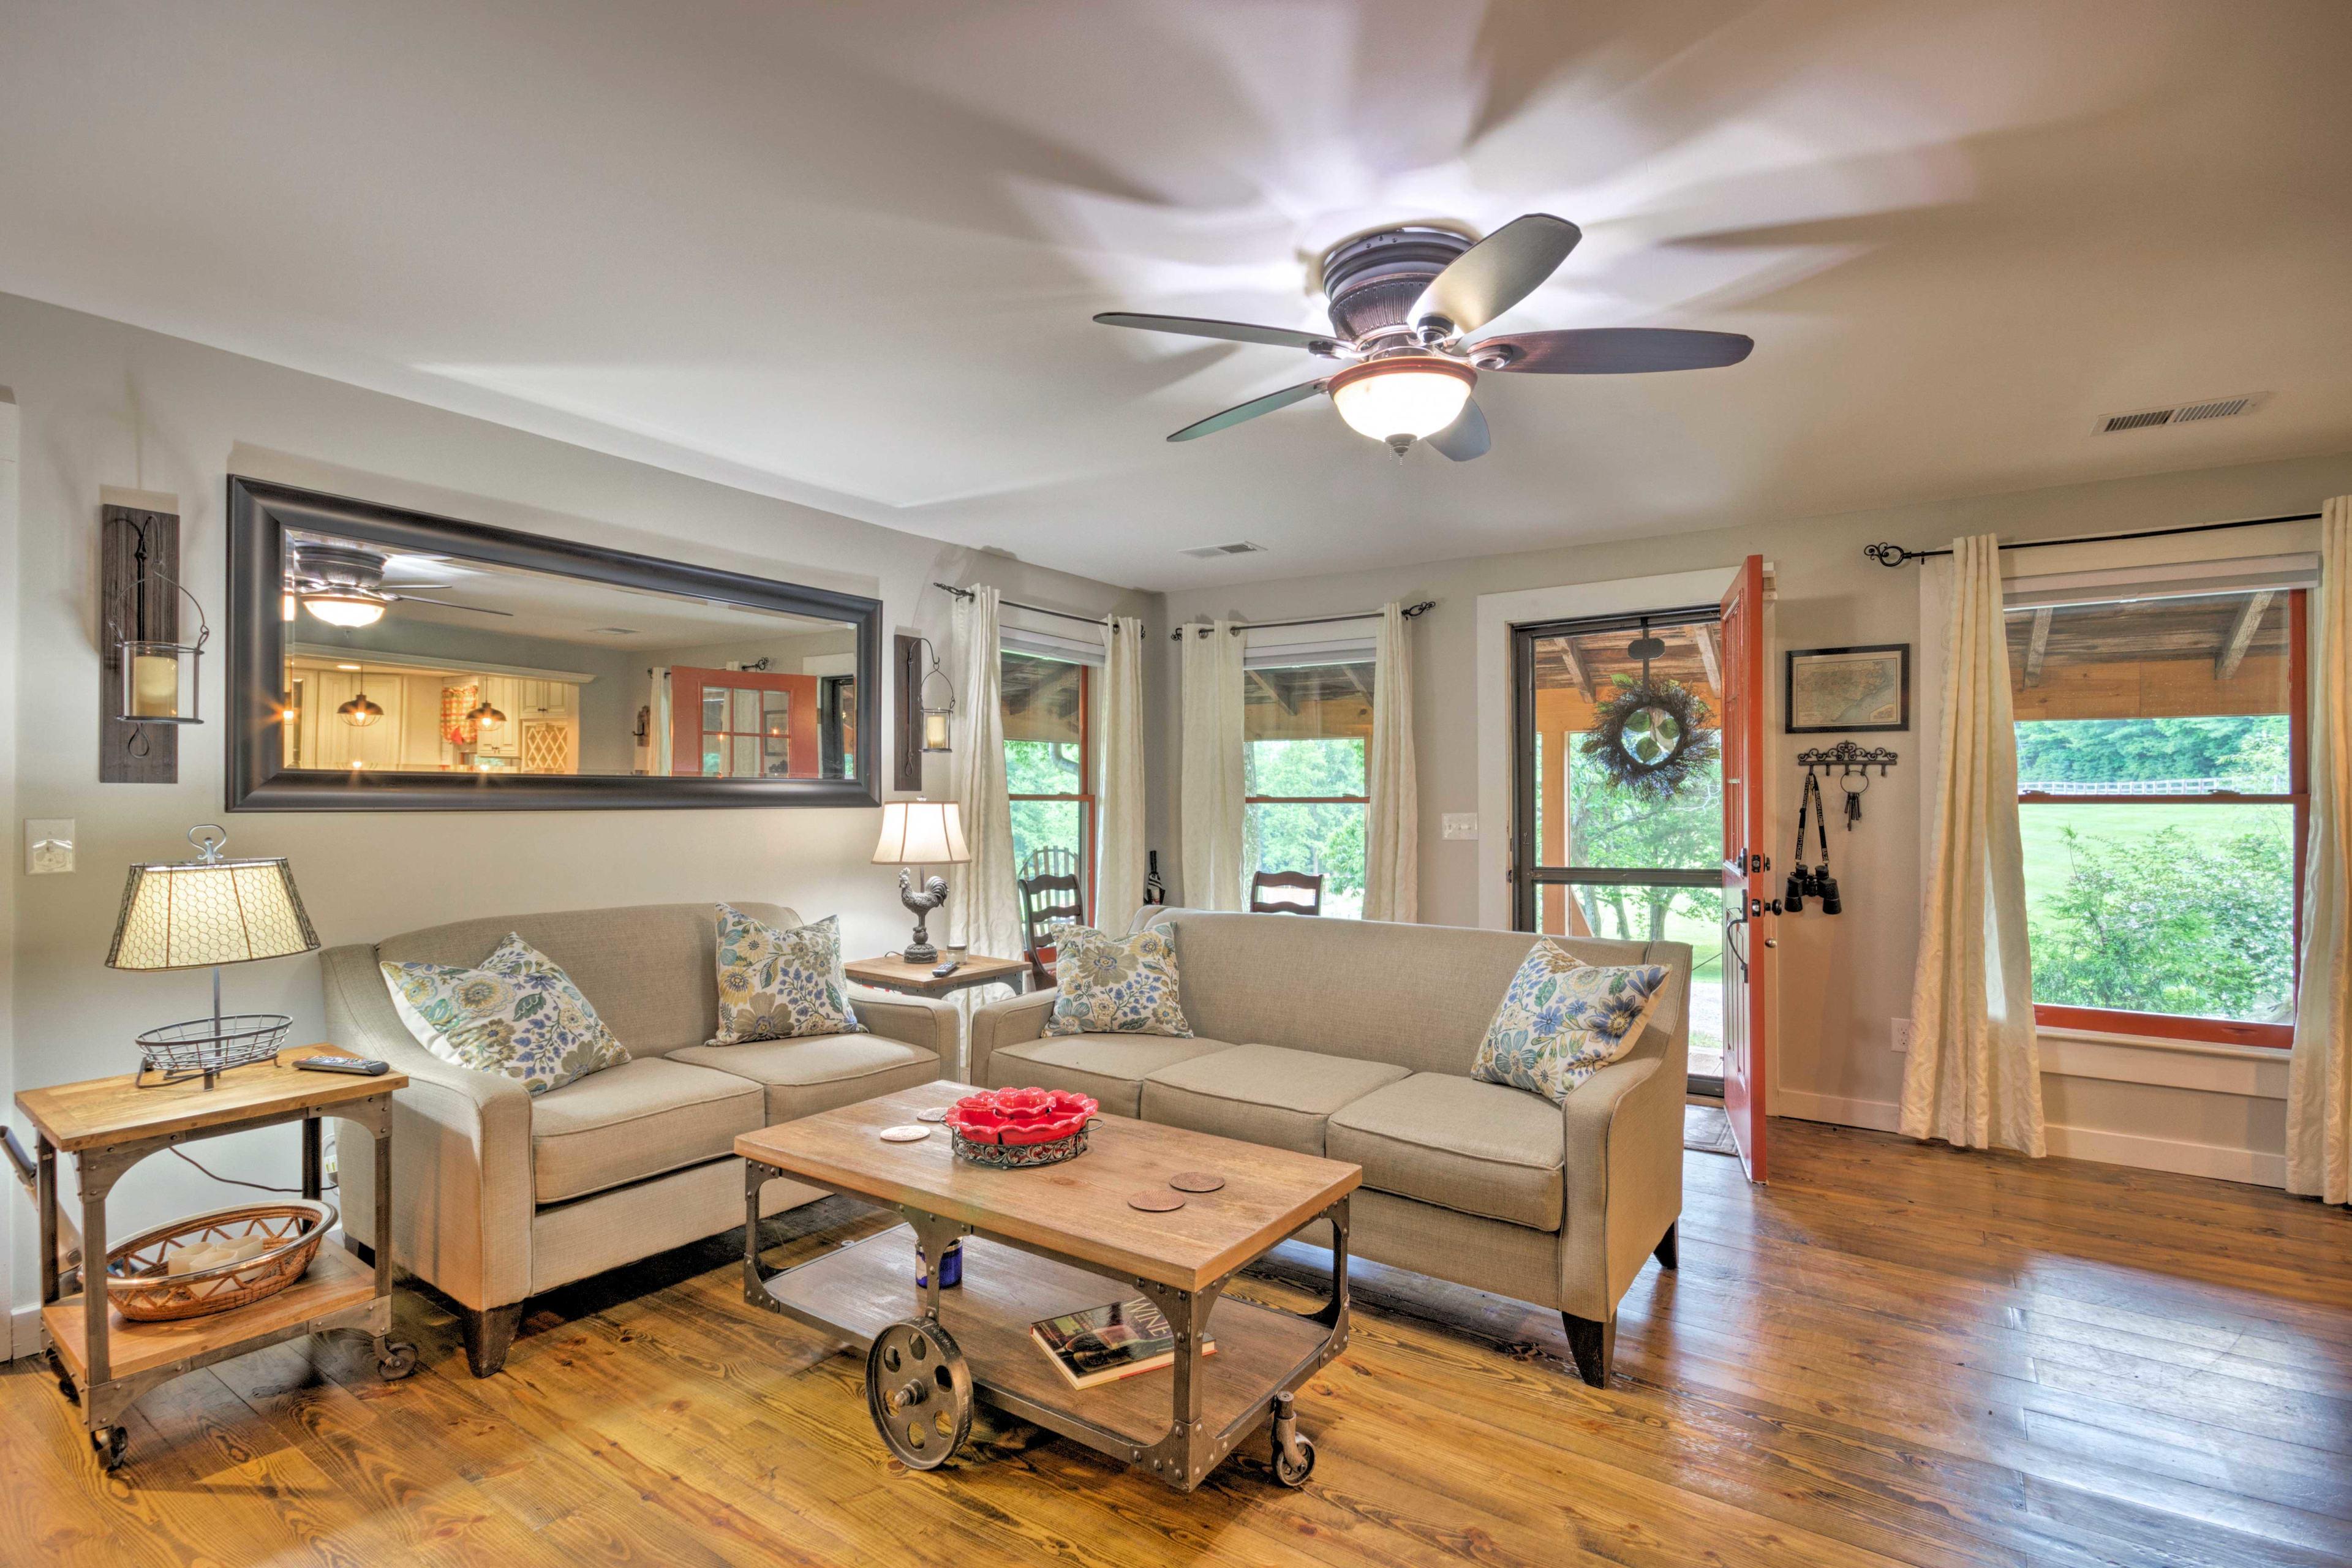 Chic modern farmhouse-style decor defines the interior.